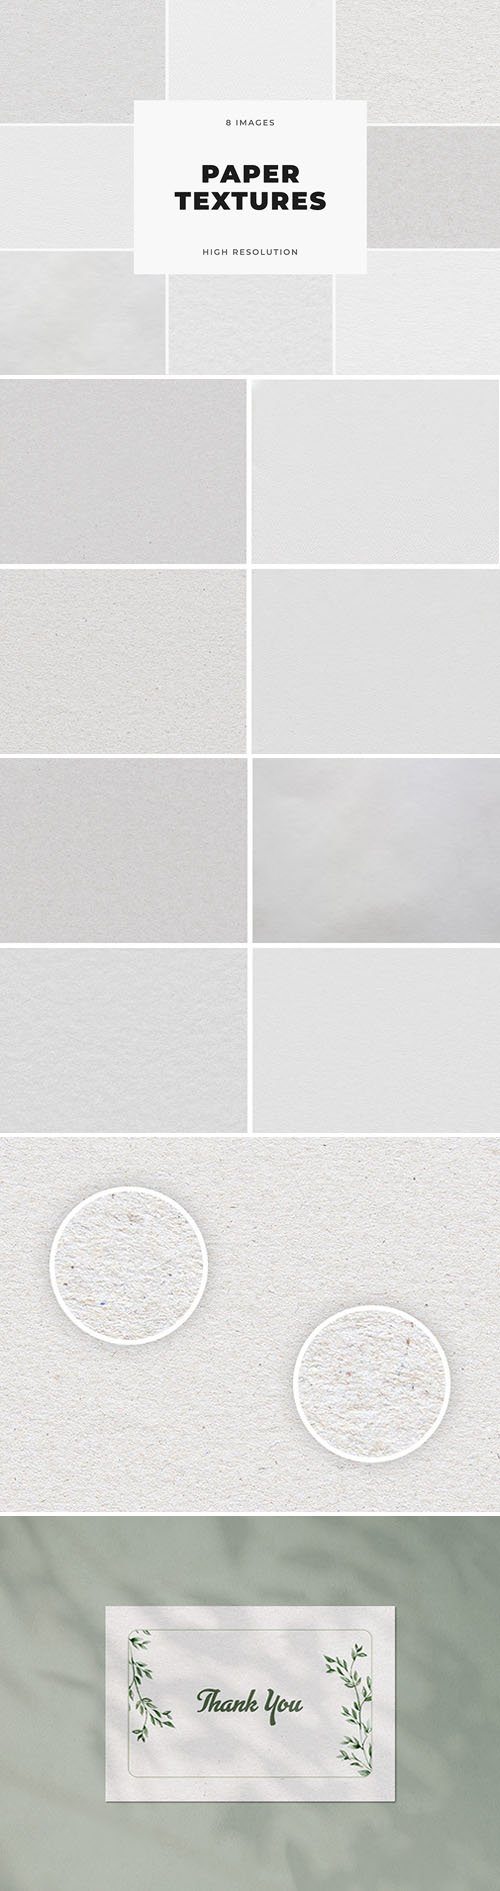 8 Paper Textures Kit